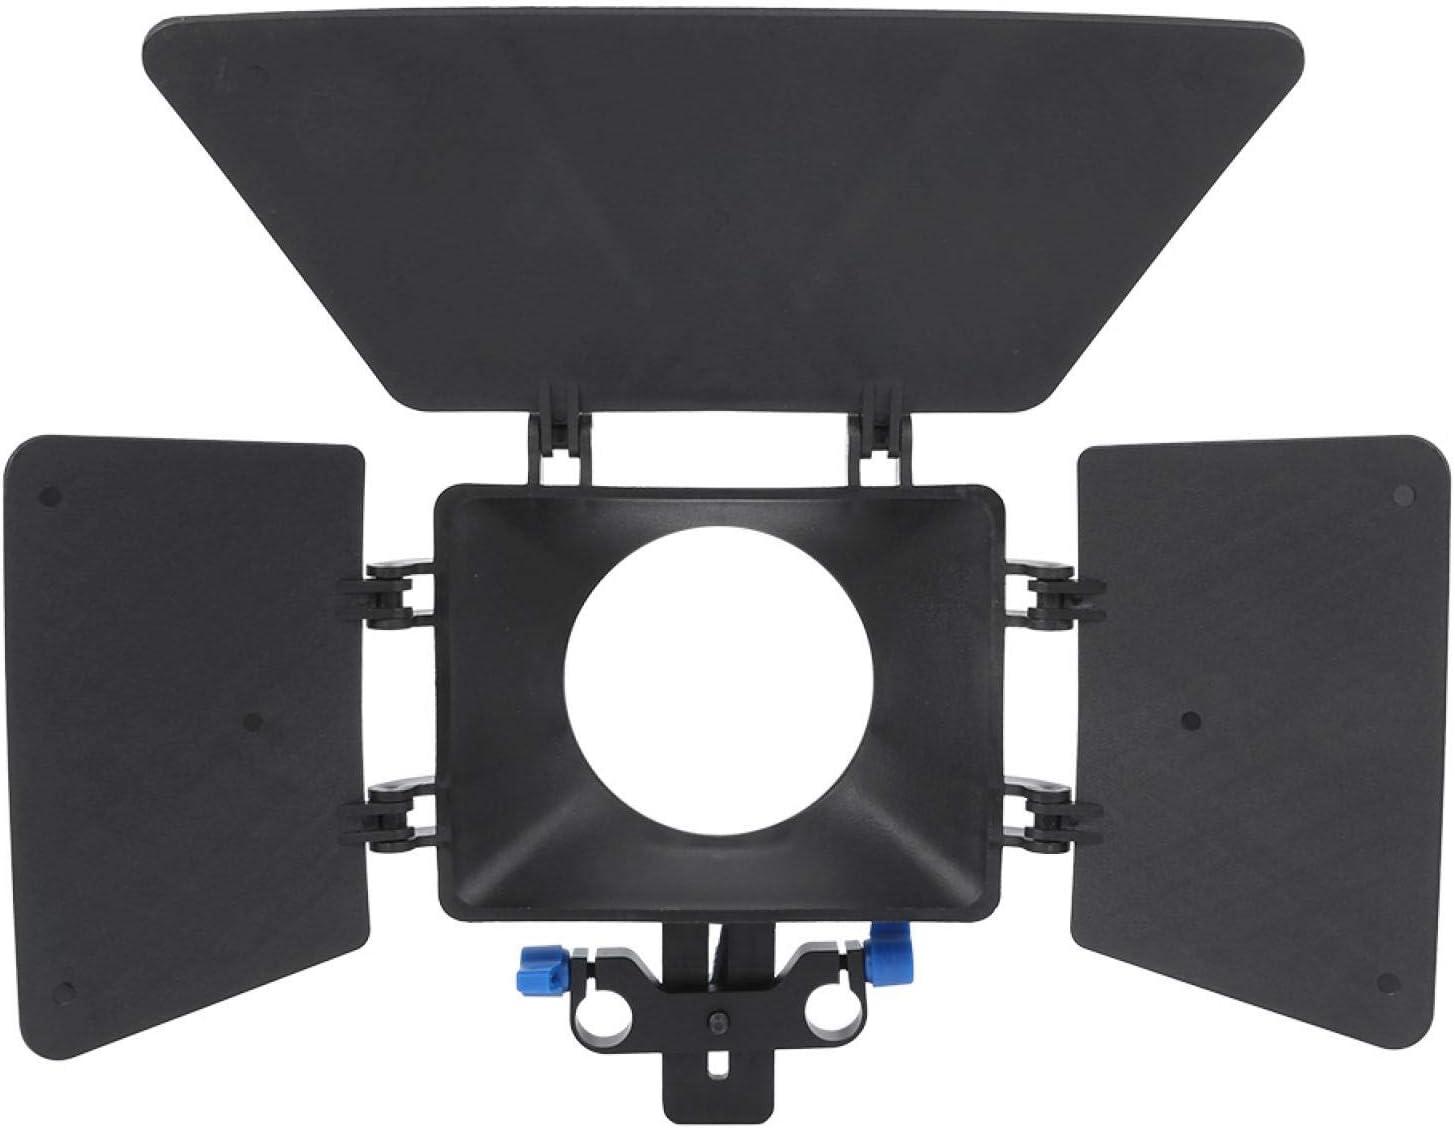 SALUTUYA DSLR New product type Camera Lens Hood Suit Cheap sale Light Box Block Matte